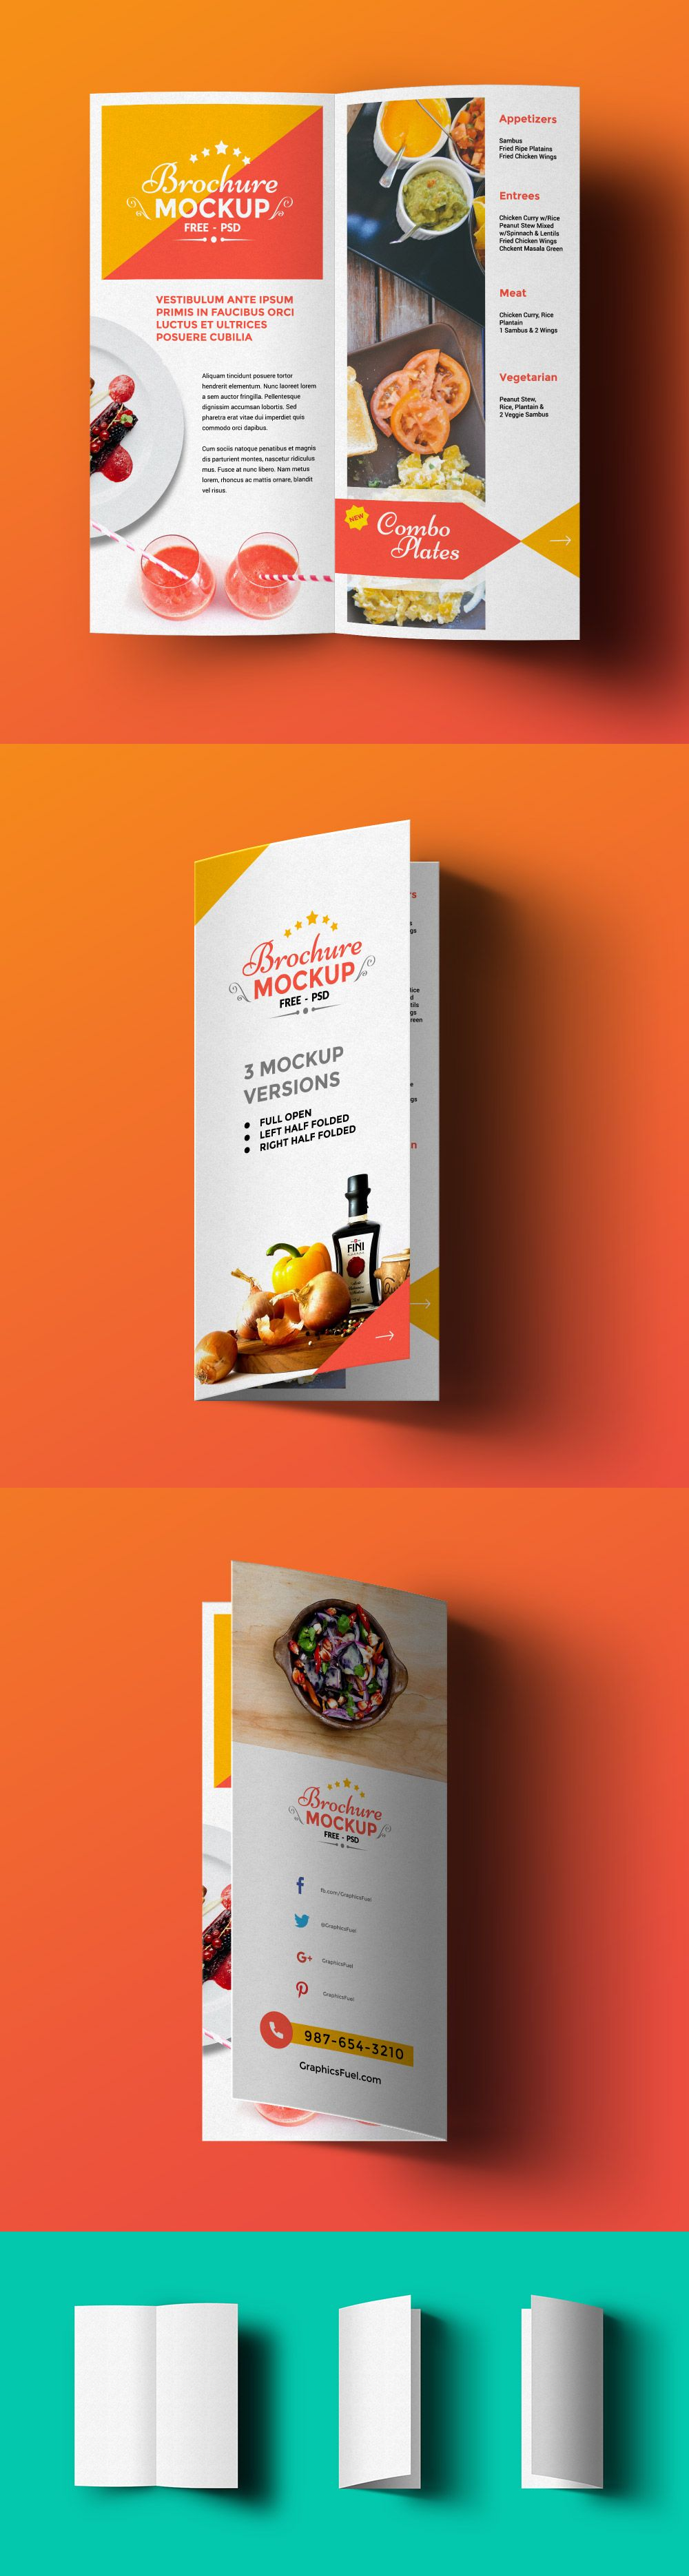 Free Bi Fold Brochure Mockup Photoshop Mockups Pinterest